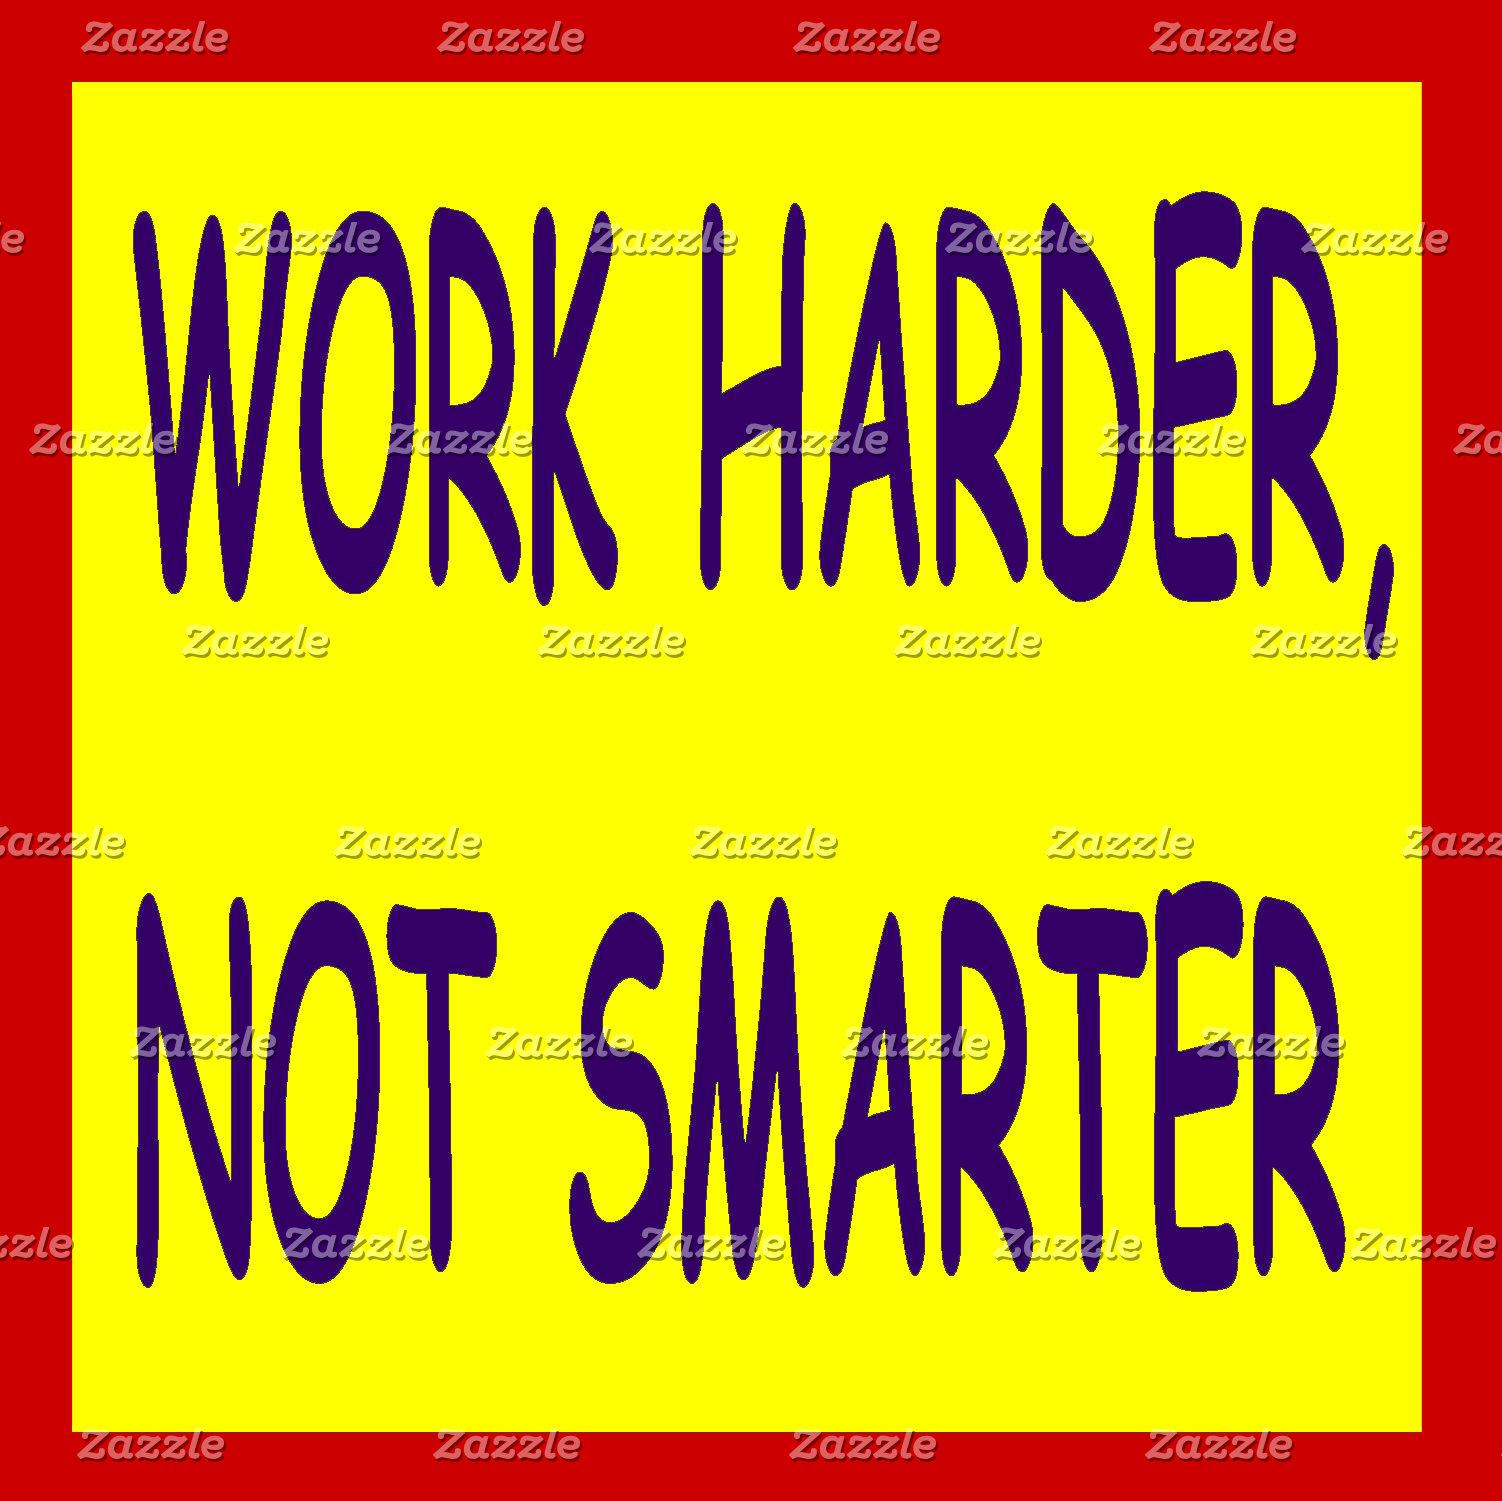 WORK HARDER NOT SMARTER